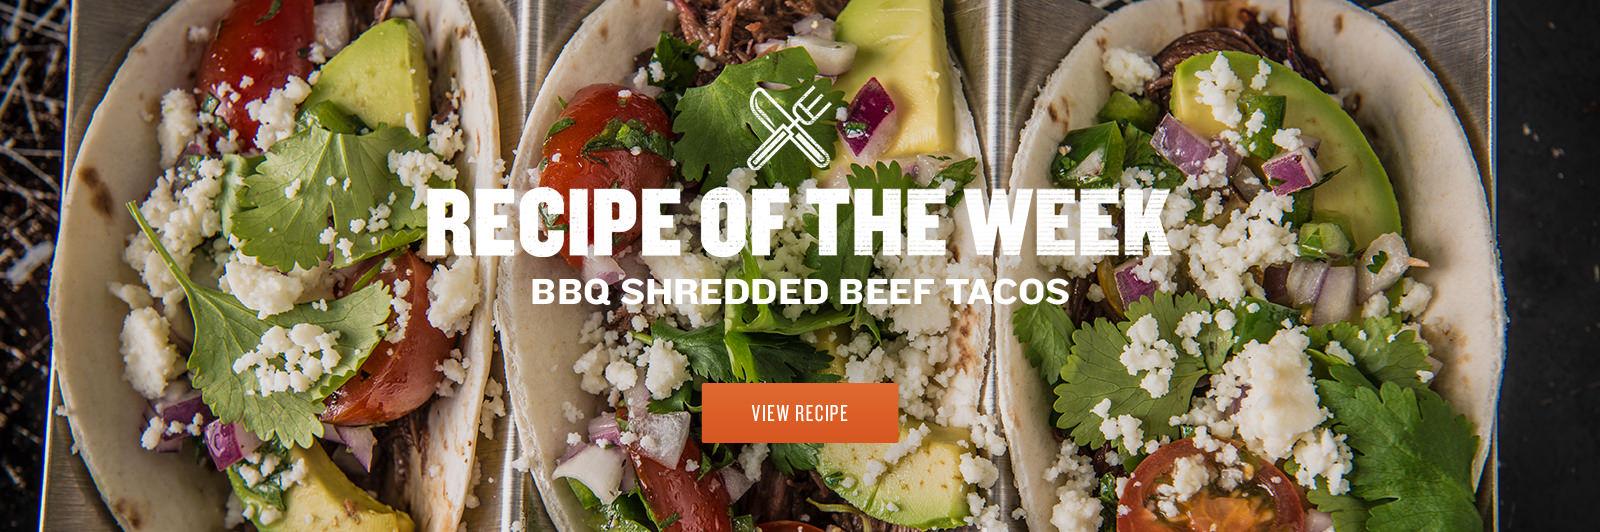 BBQ Shredded Beef Tacos